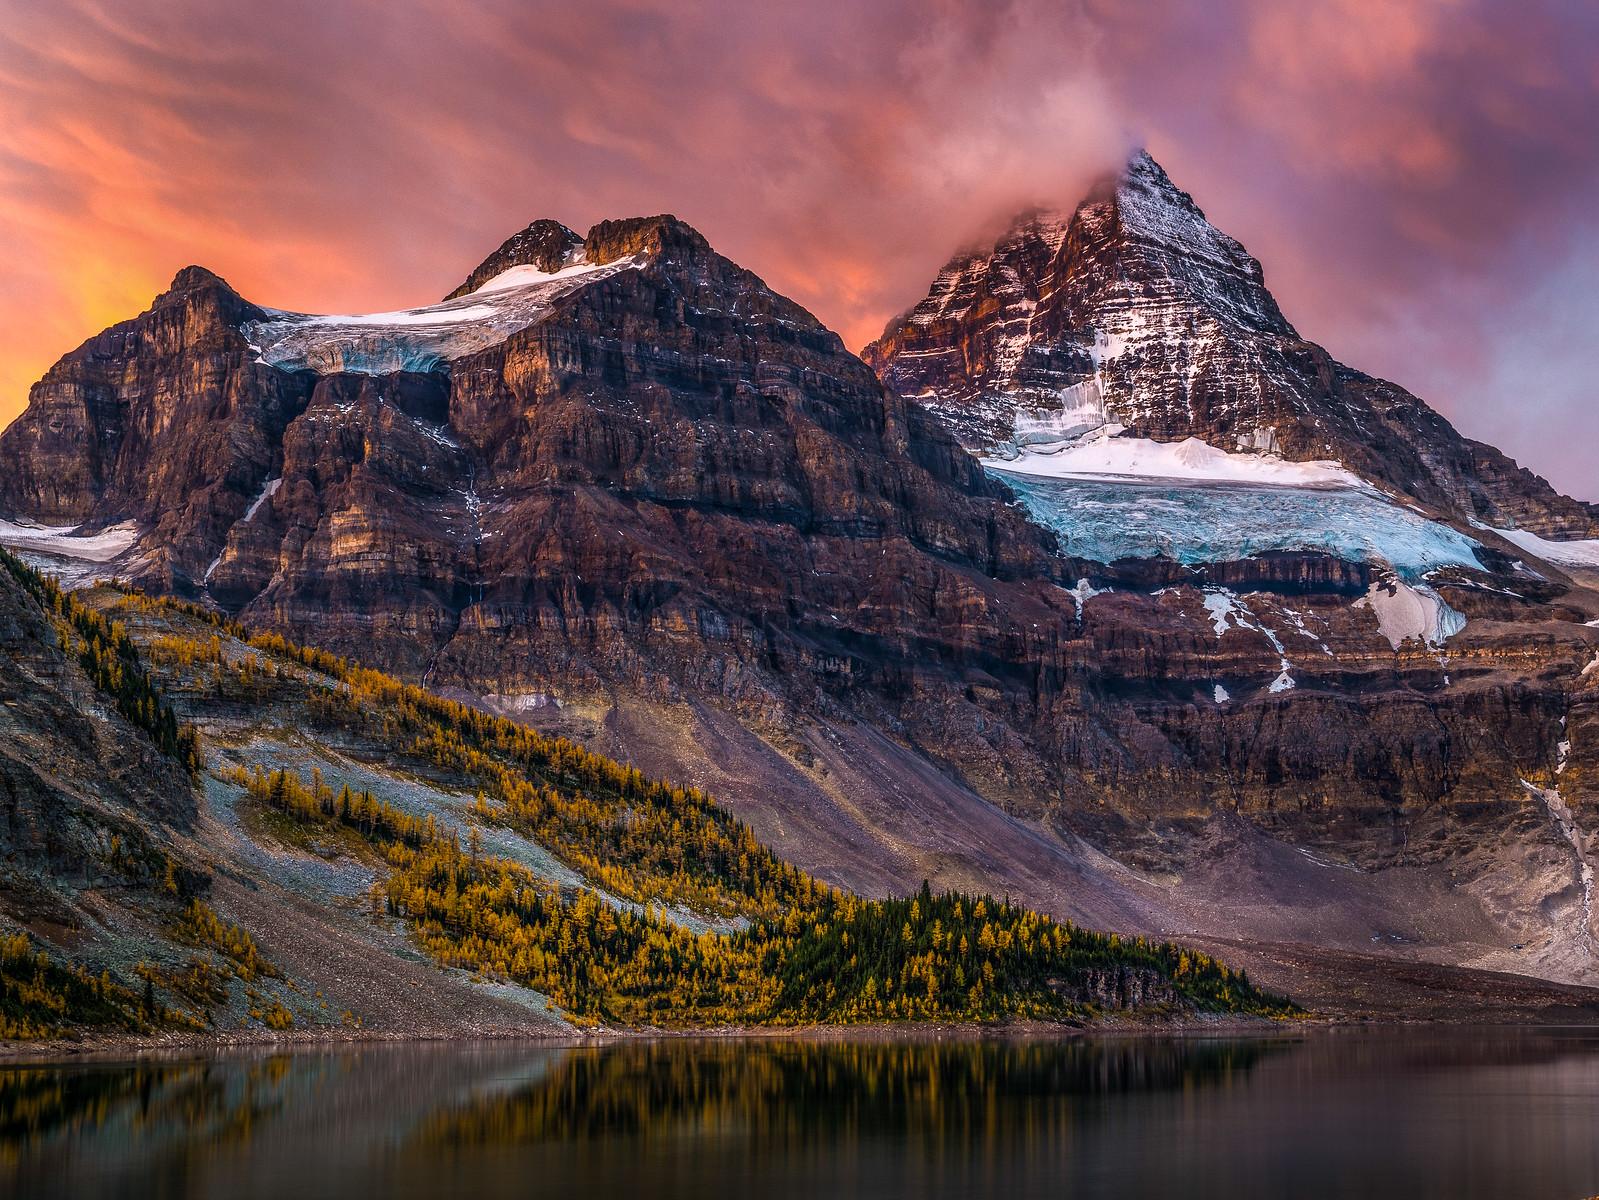 Mt Assiniboine 2014 Fall Colors-X3.jpg